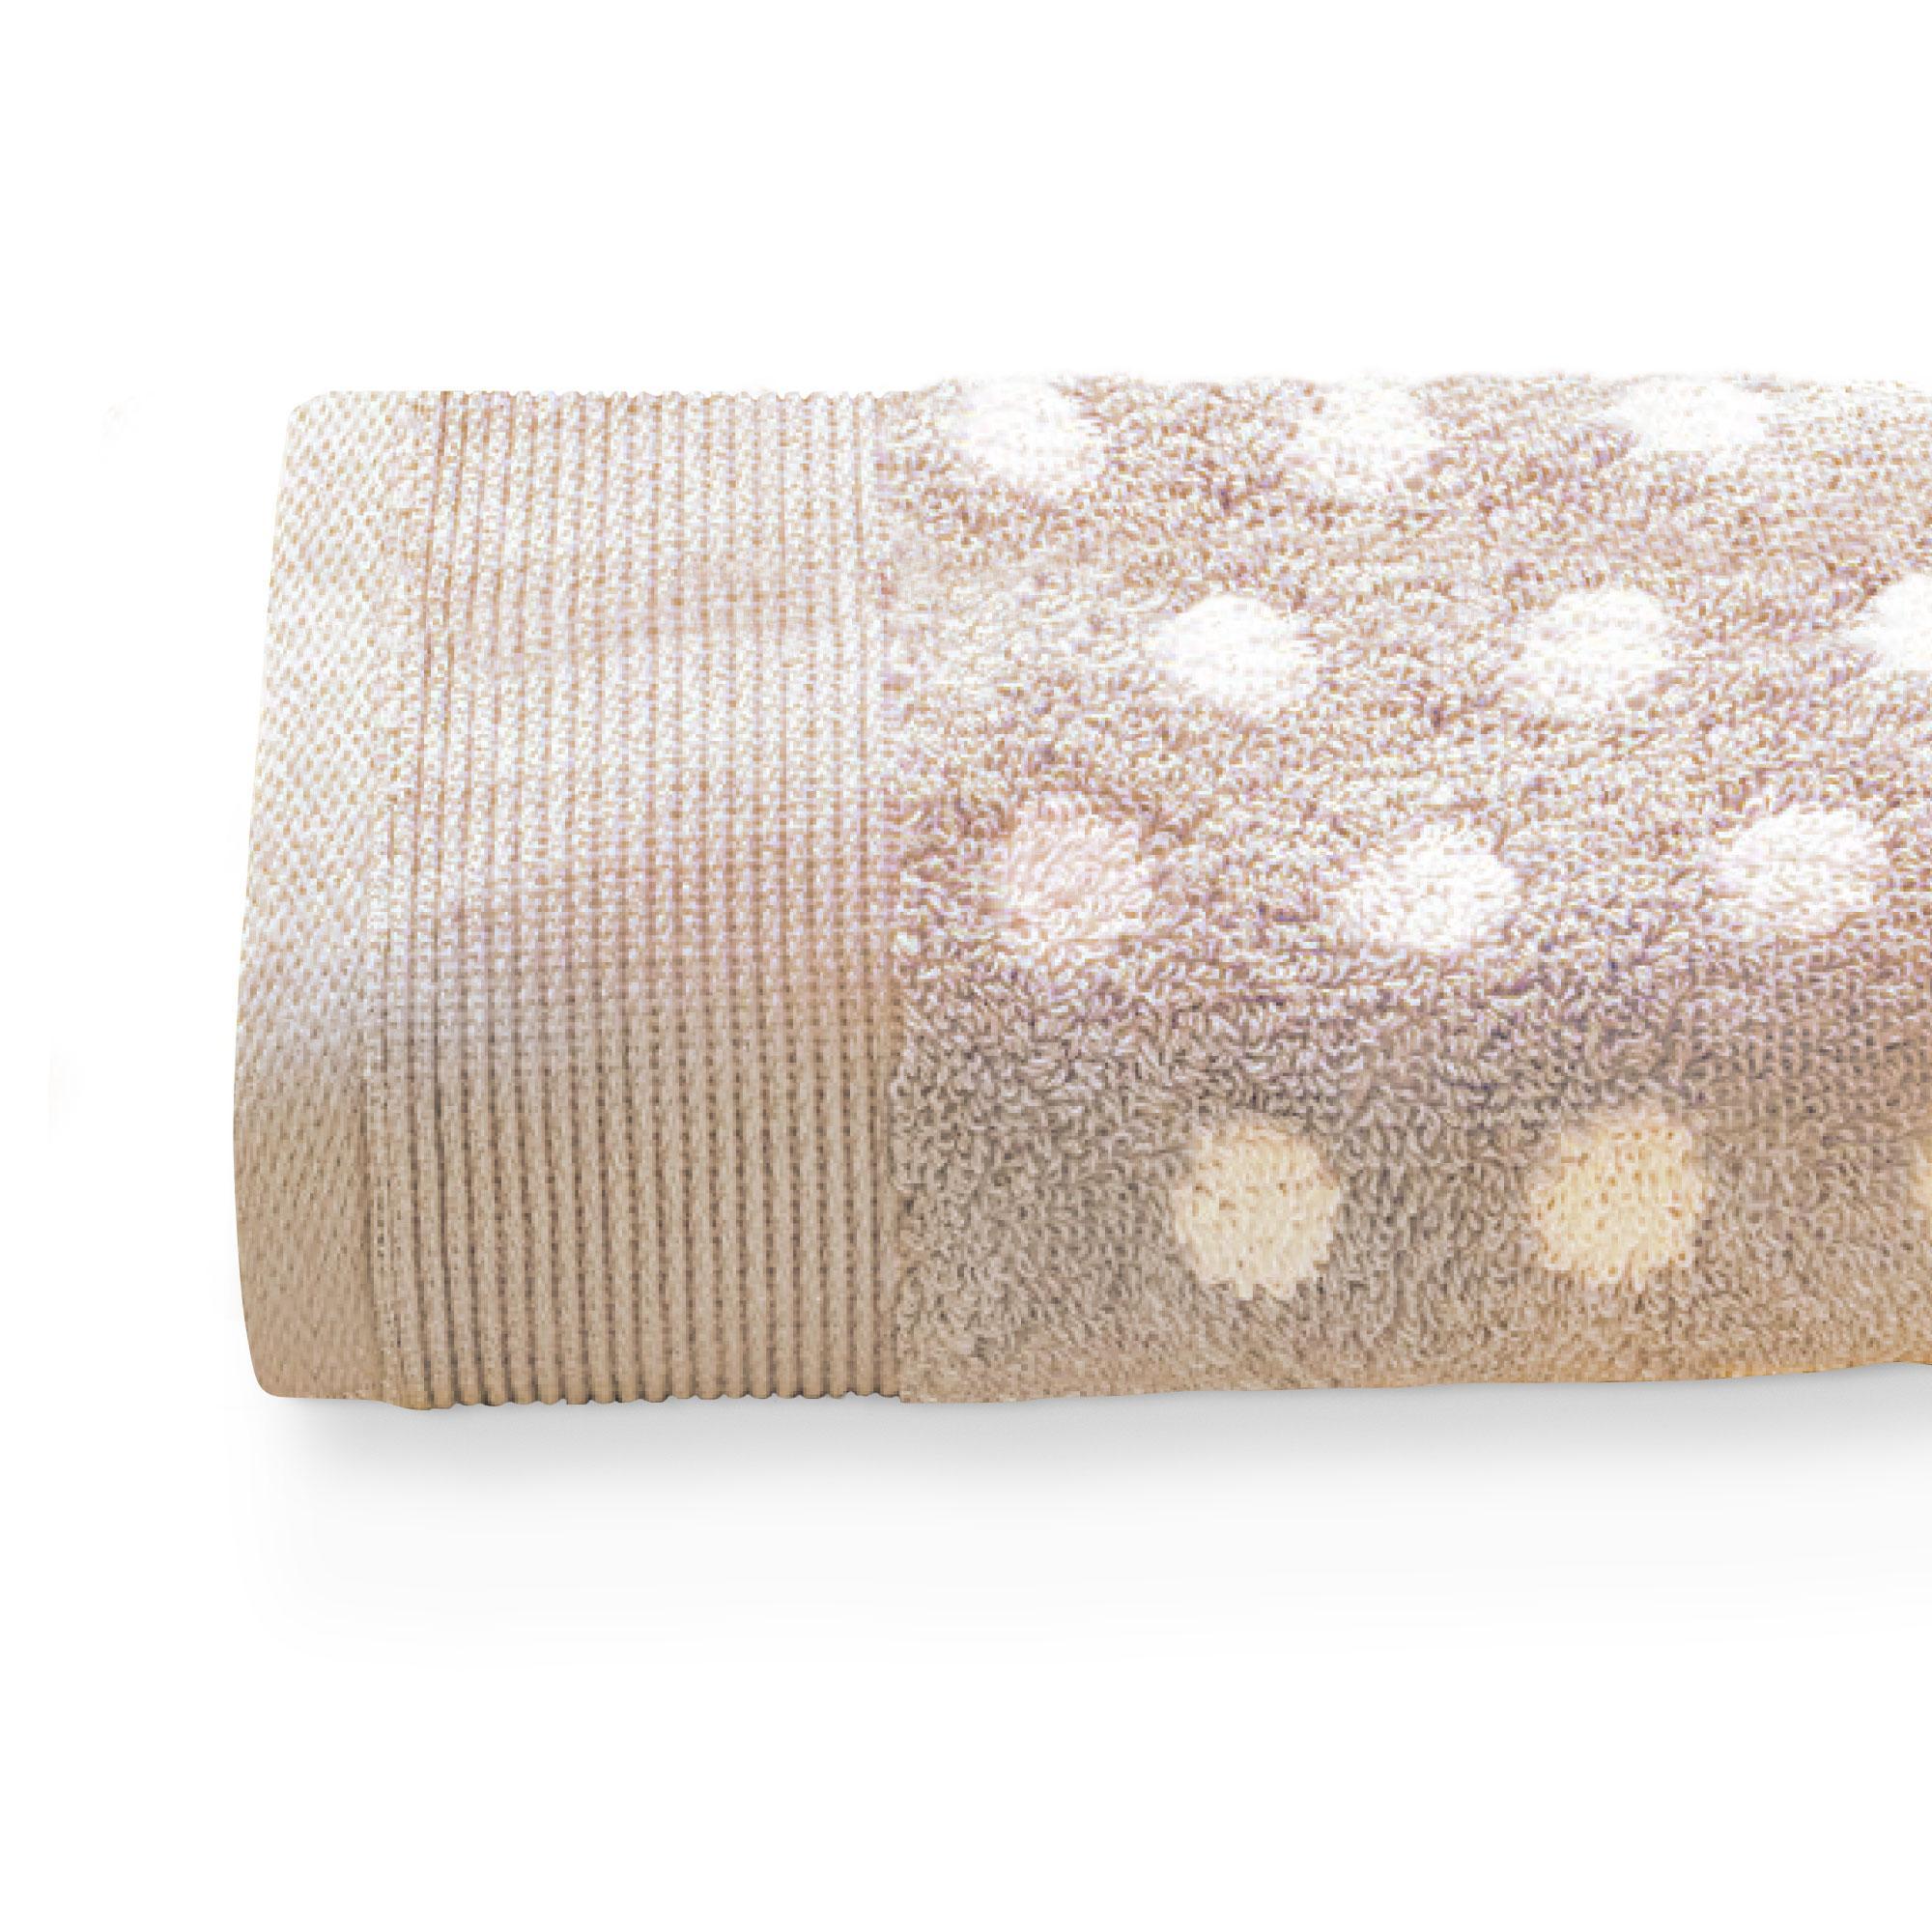 Drap de bain 100x150cm uni coton DOMINO Beige | Linnea vente de ...